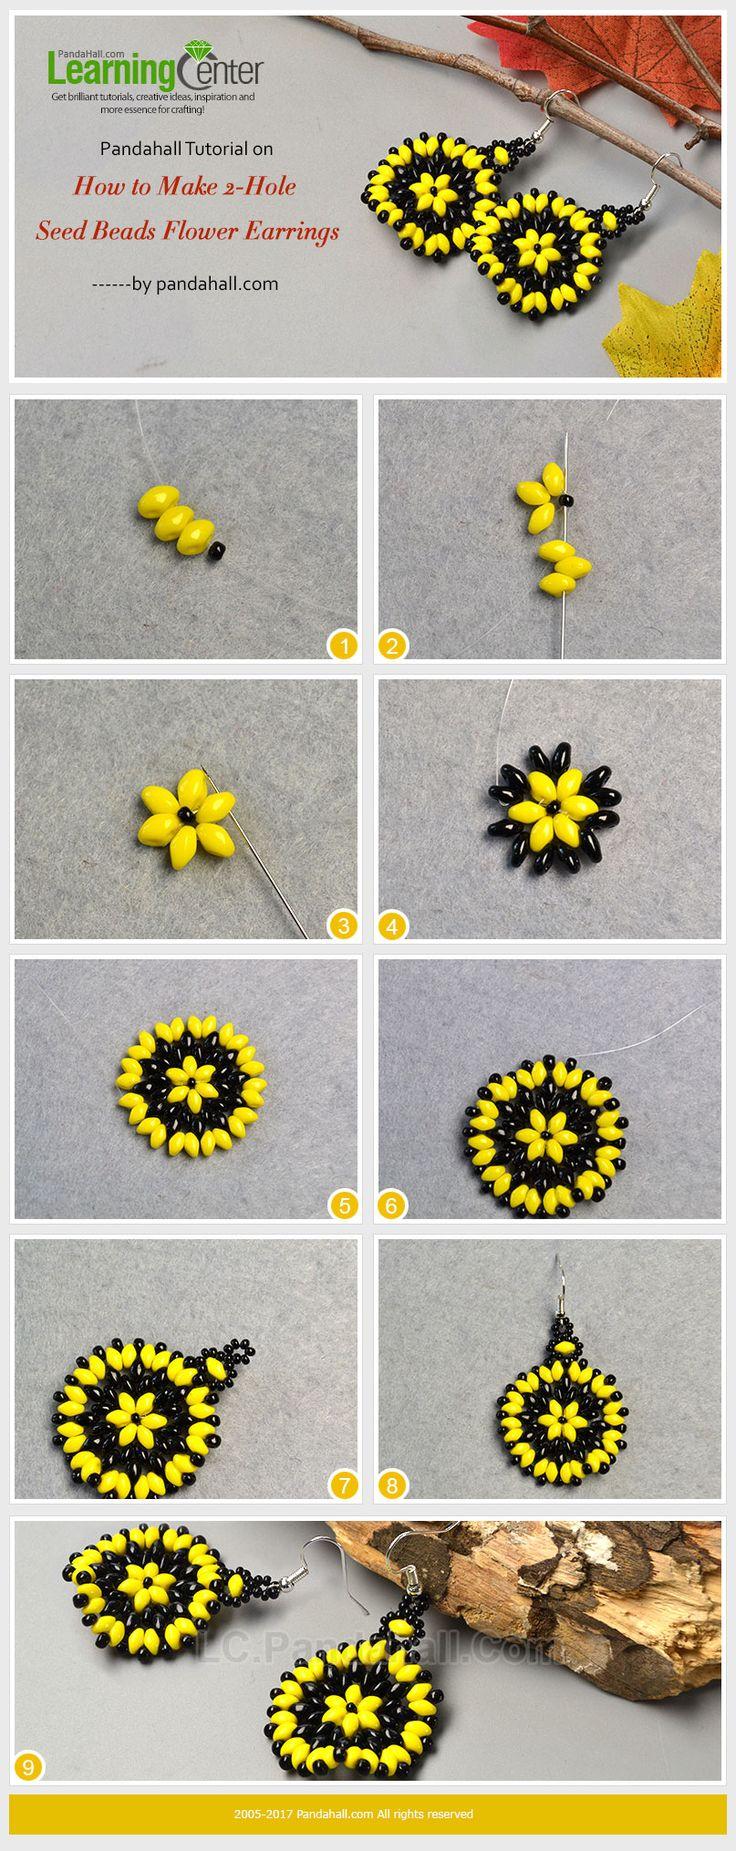 Pandahall Tutorial on How to Make 2-Hole Seed Beads Flower Earrings